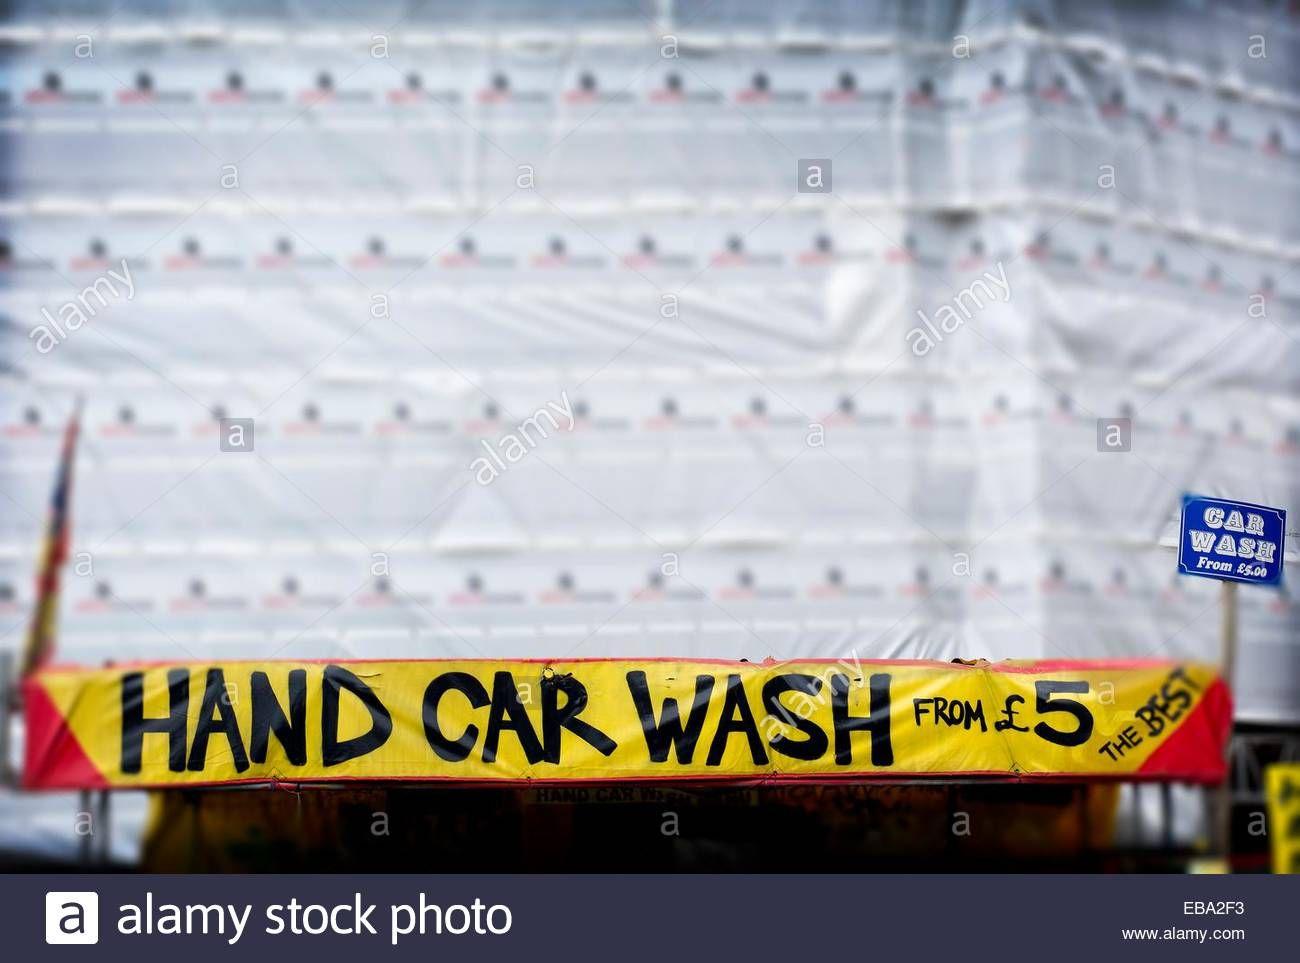 Download this stock image Hand Car Wash, garaje en East